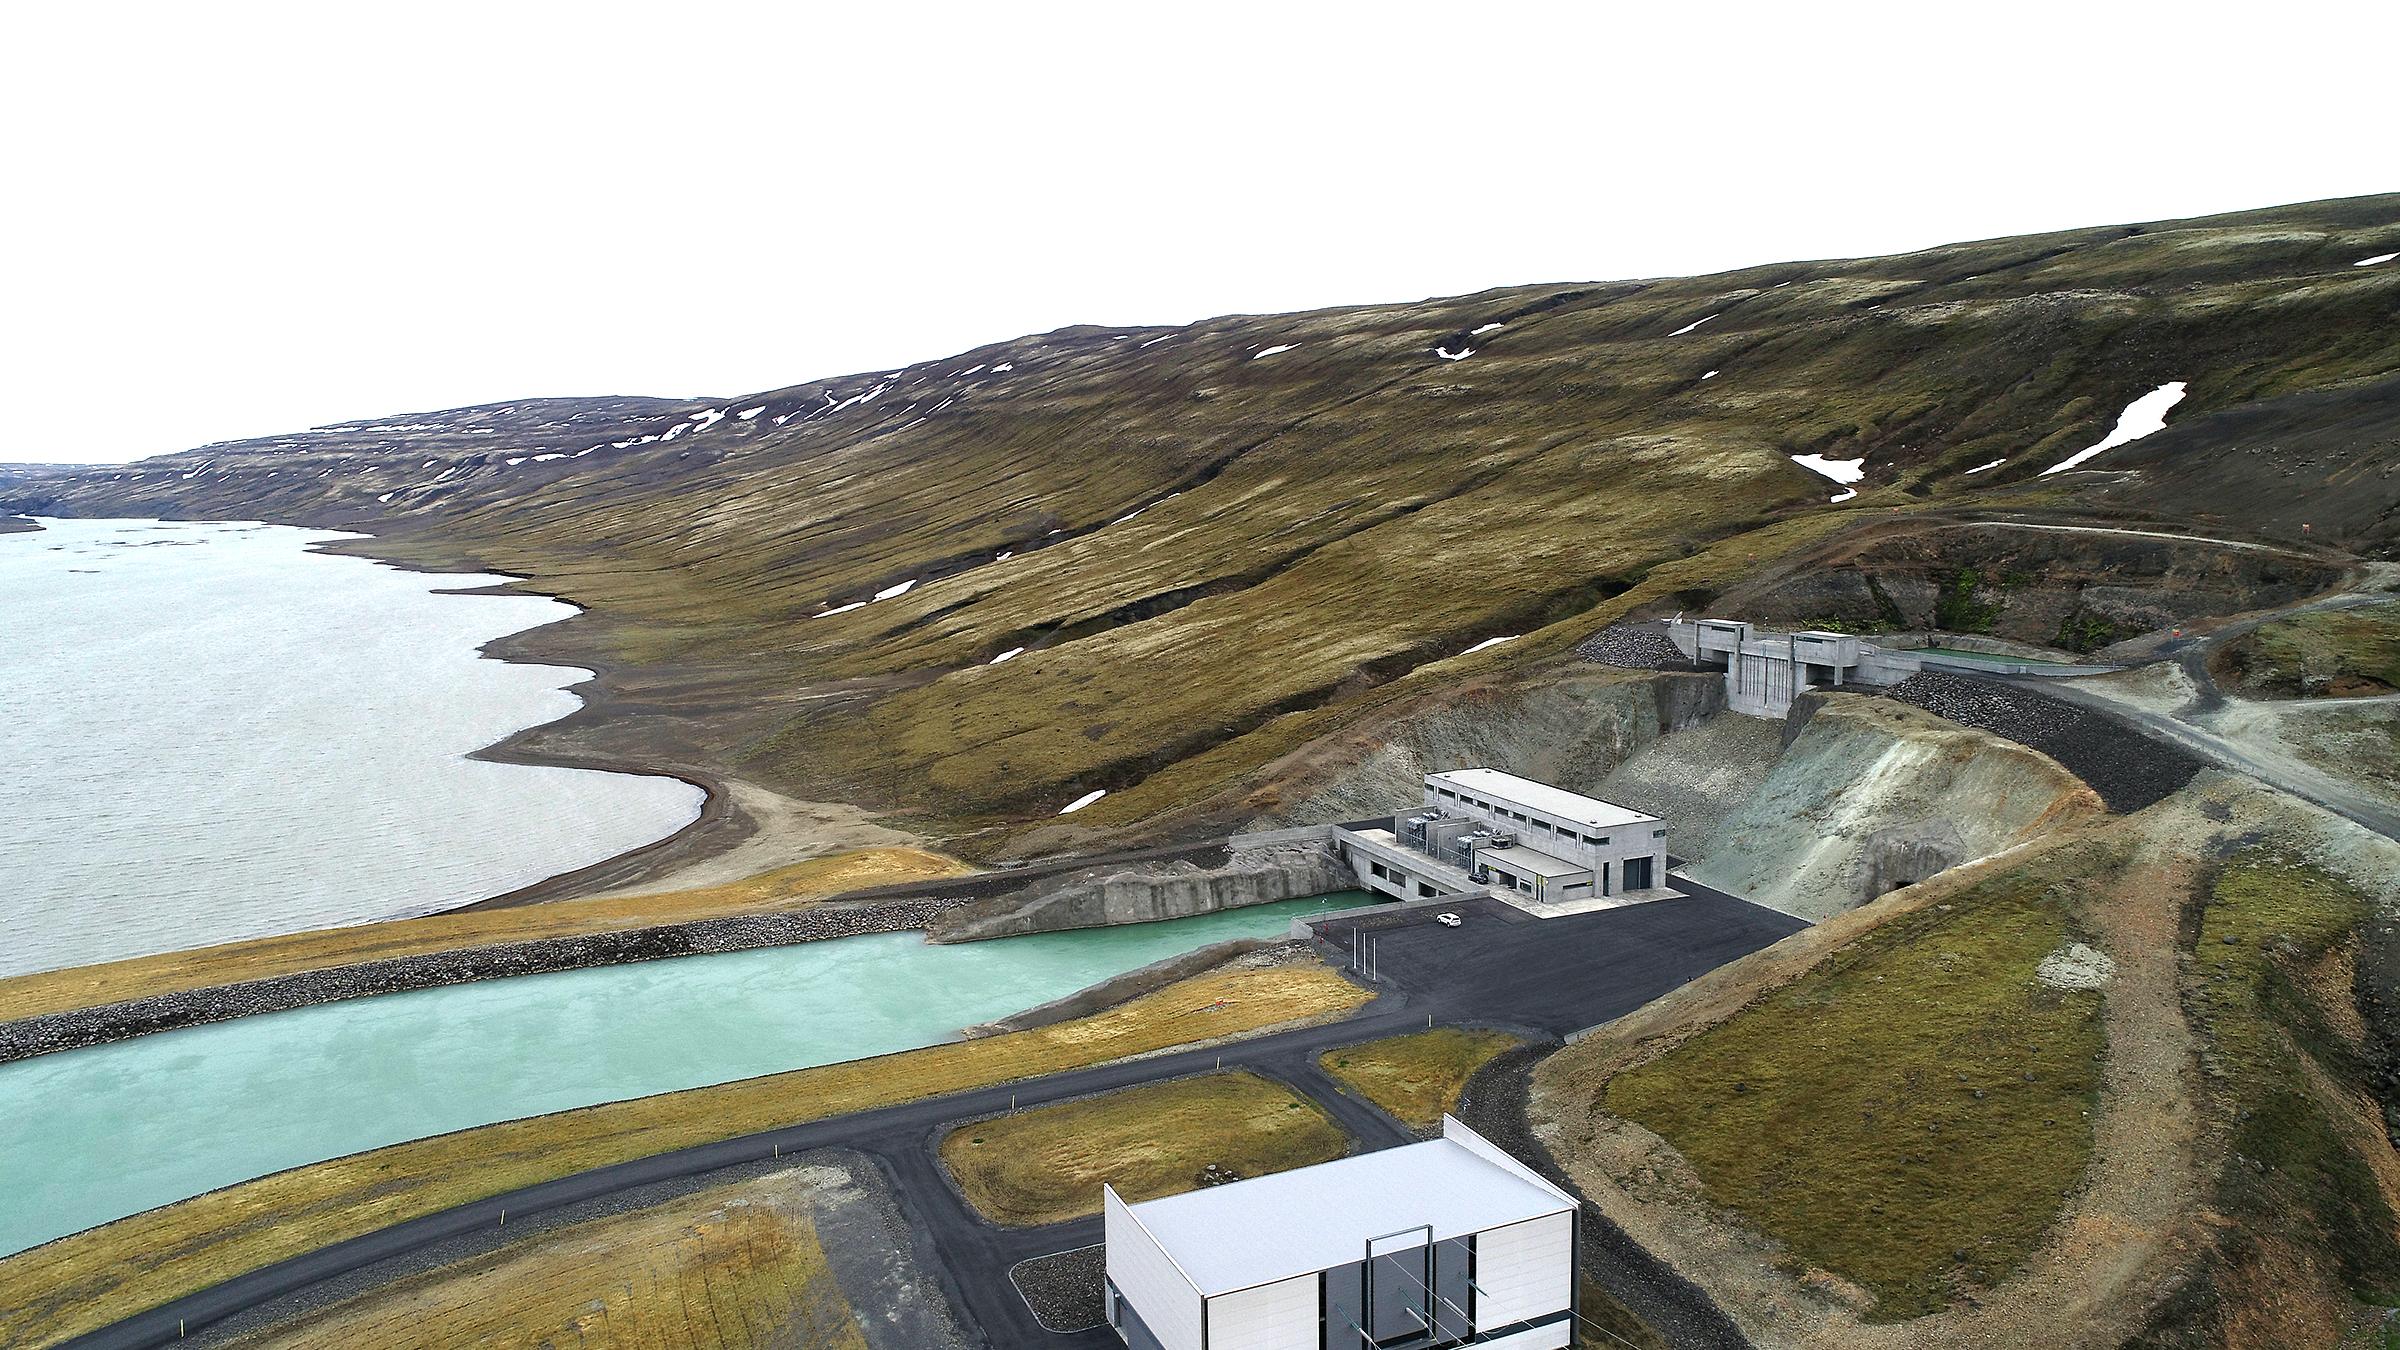 Budarhals plant in Iceland